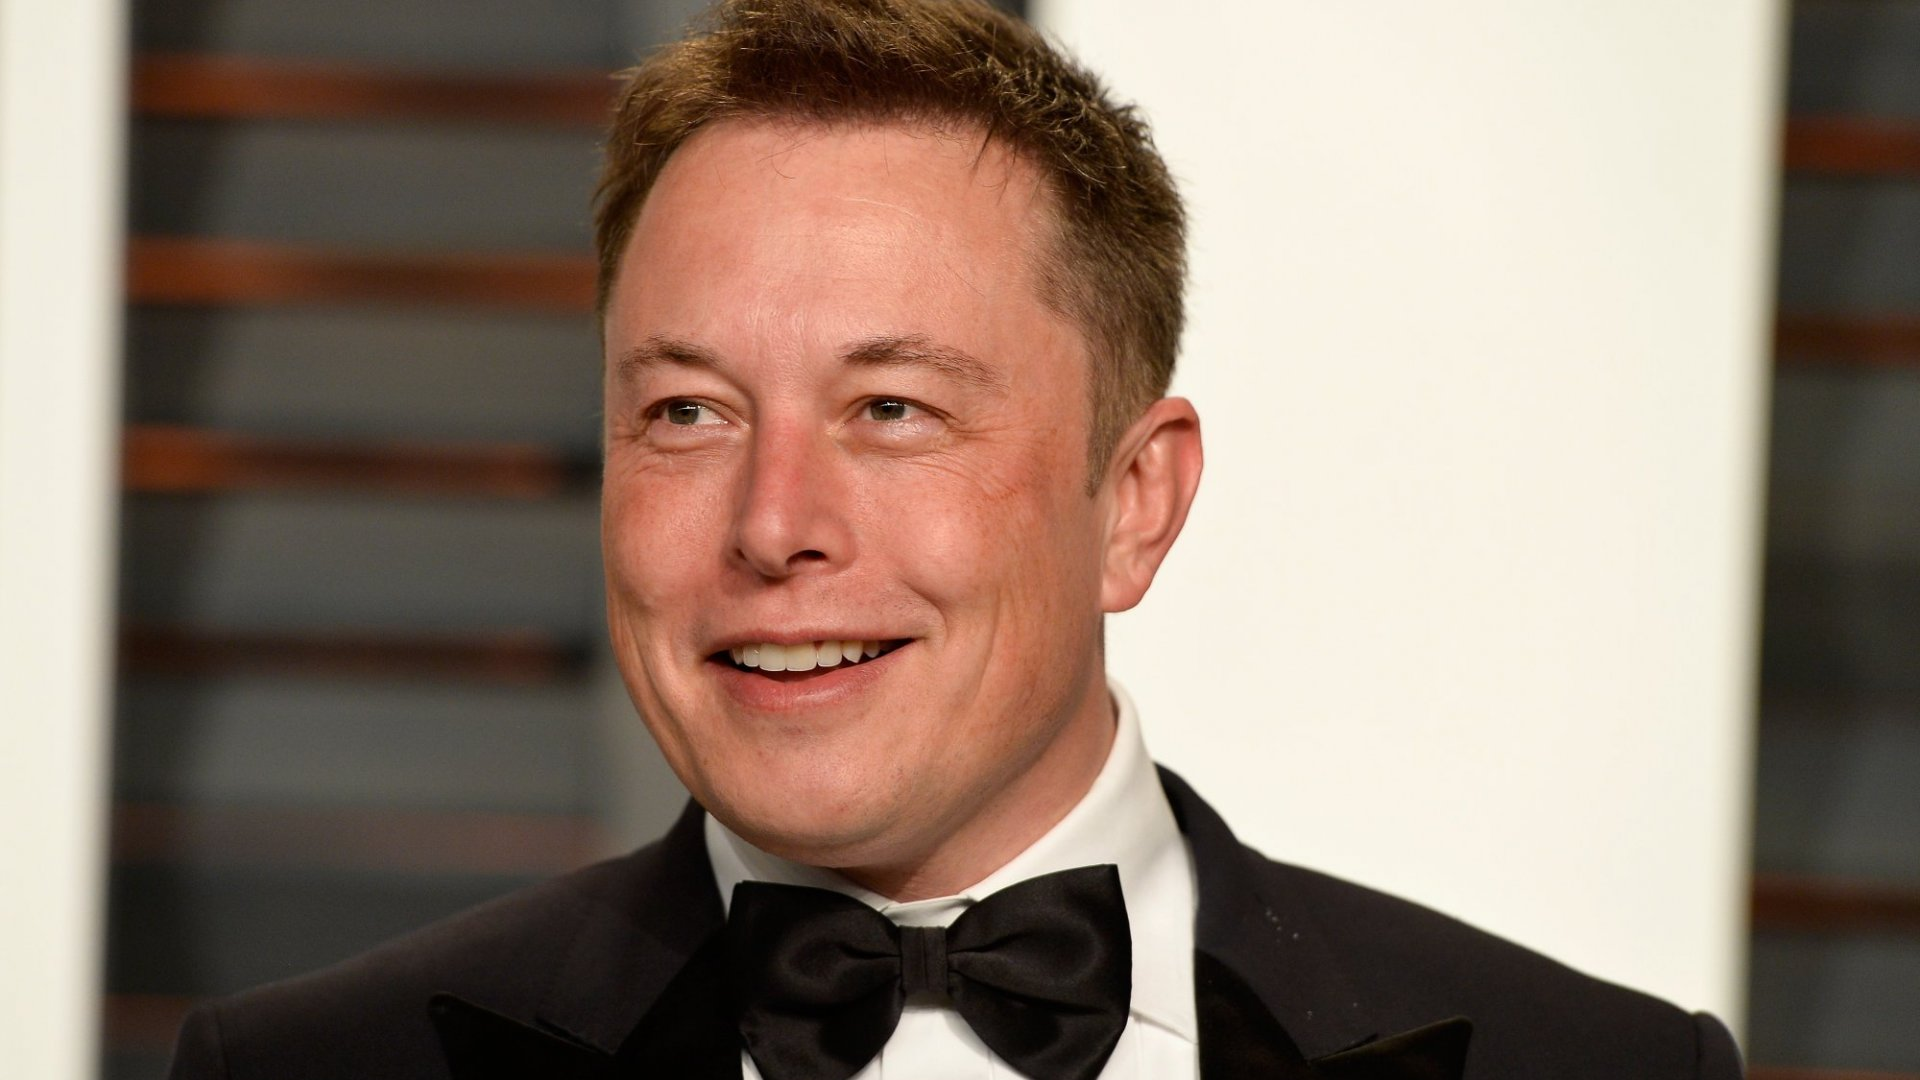 In 1 Word, Richard Branson Gave Elon Musk Some Brilliant Career Advice